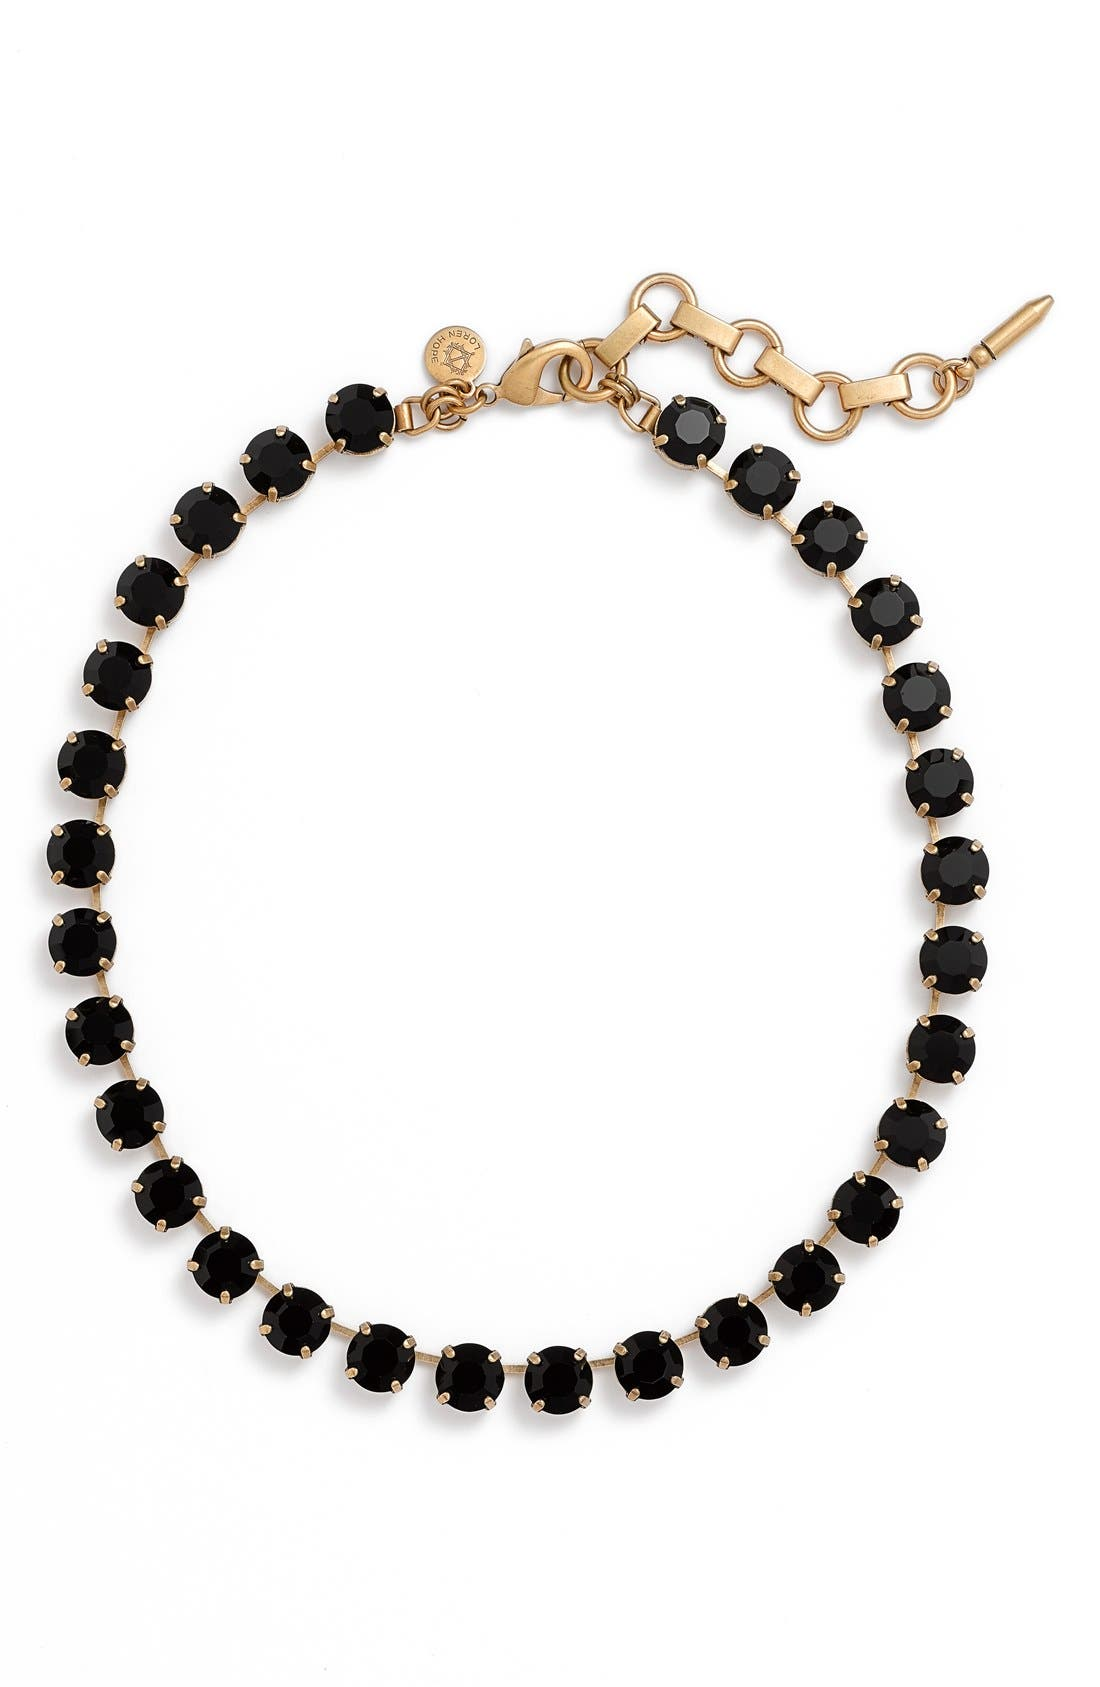 Alternate Image 1 Selected - Loren Hope 'Kaylee' Collar Necklace